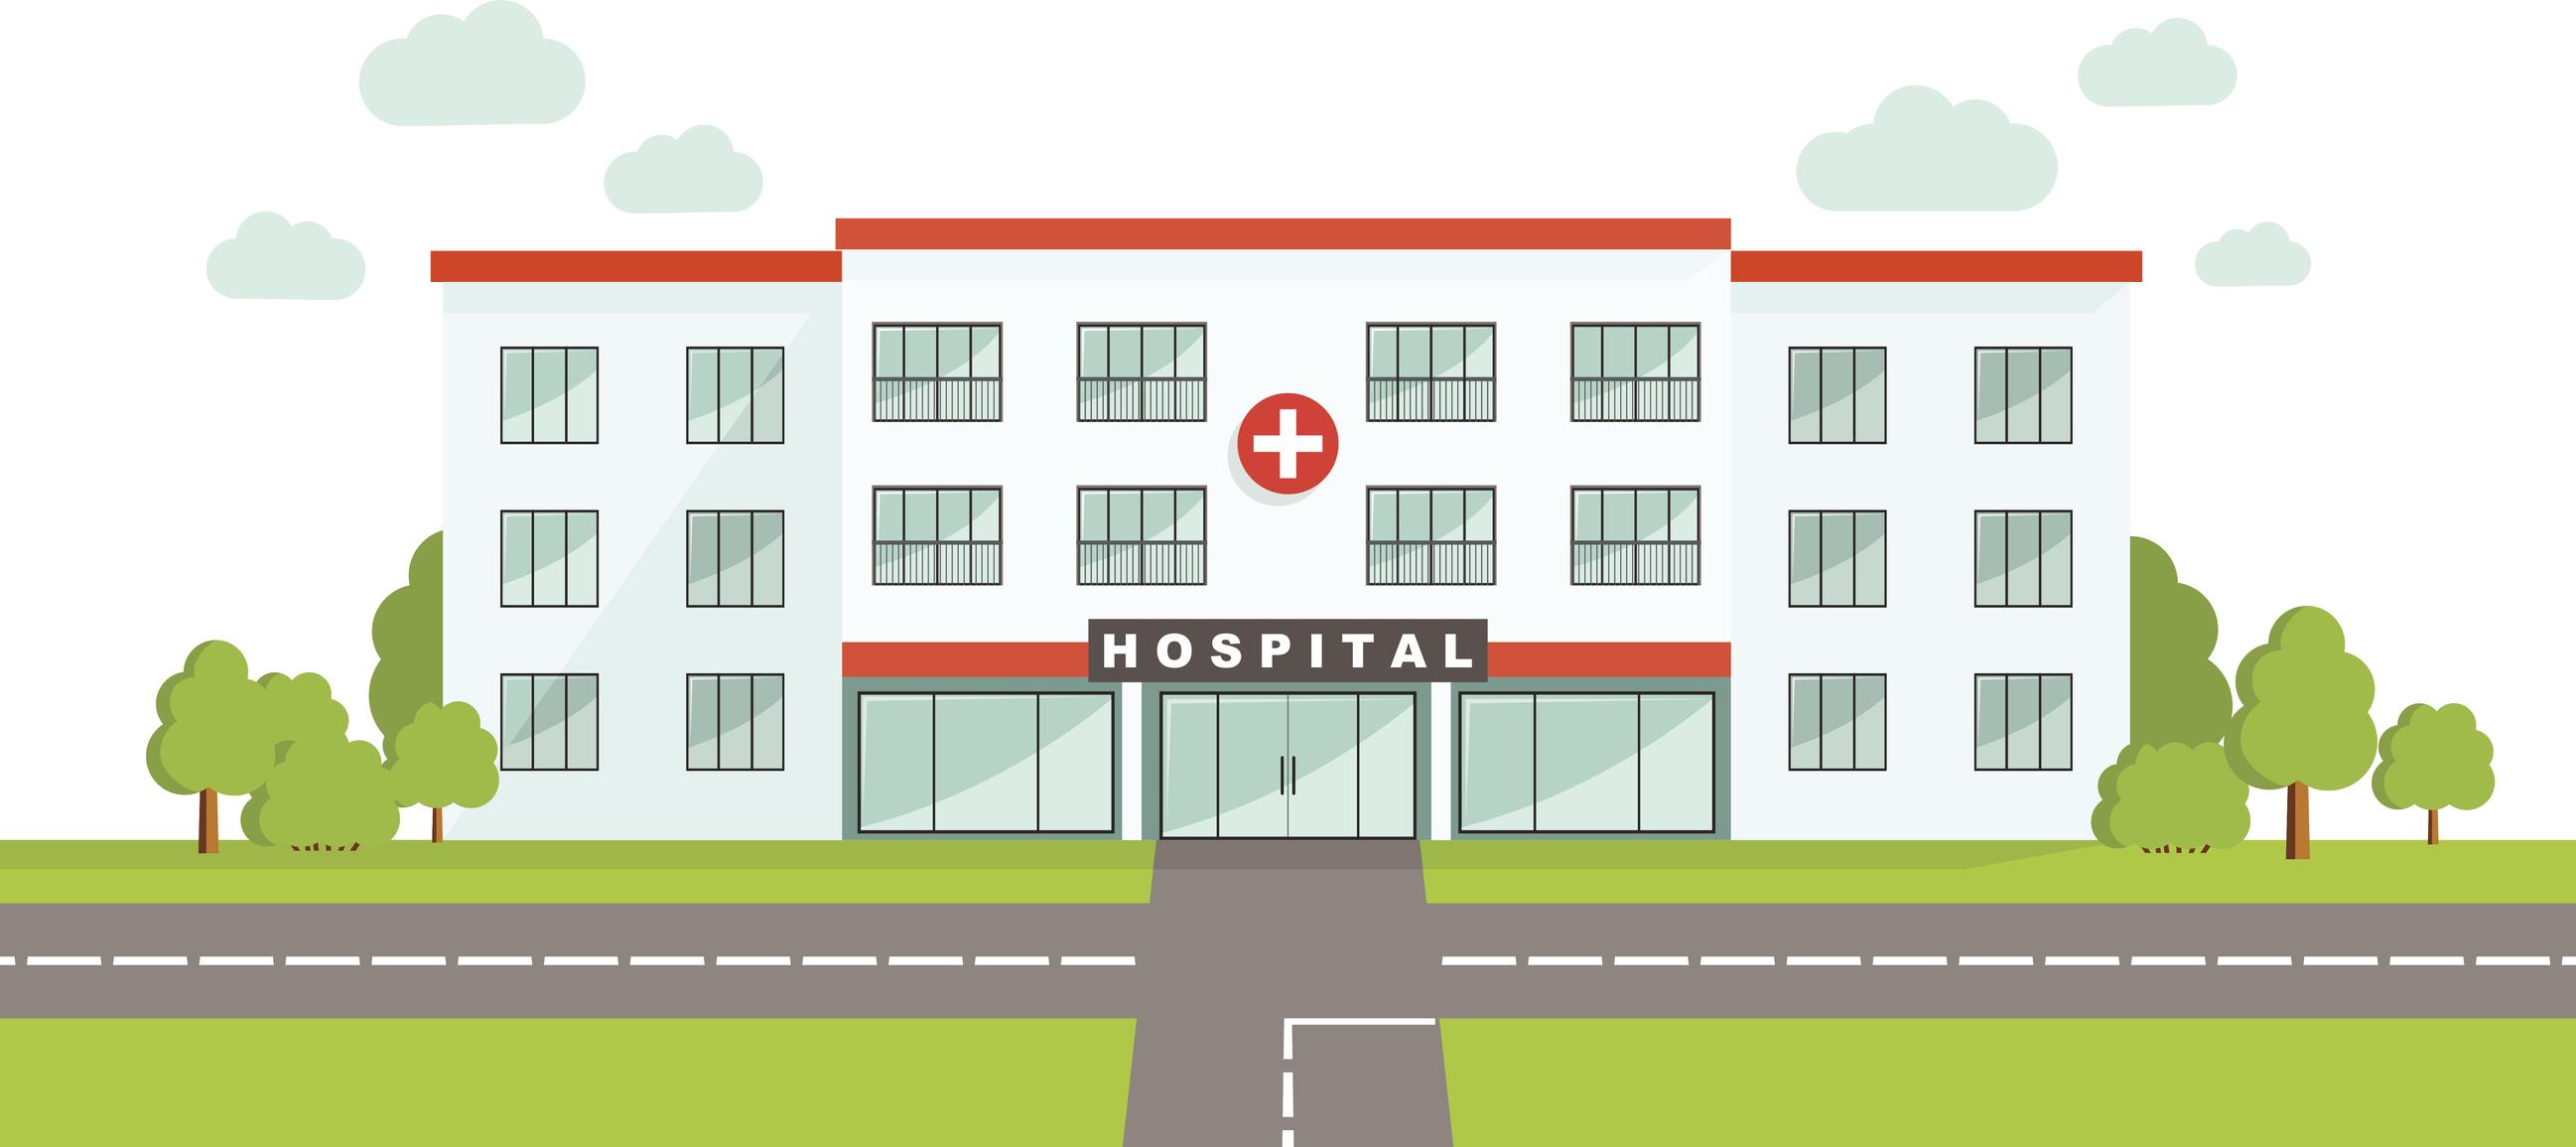 Stylized illustration of a hospital building